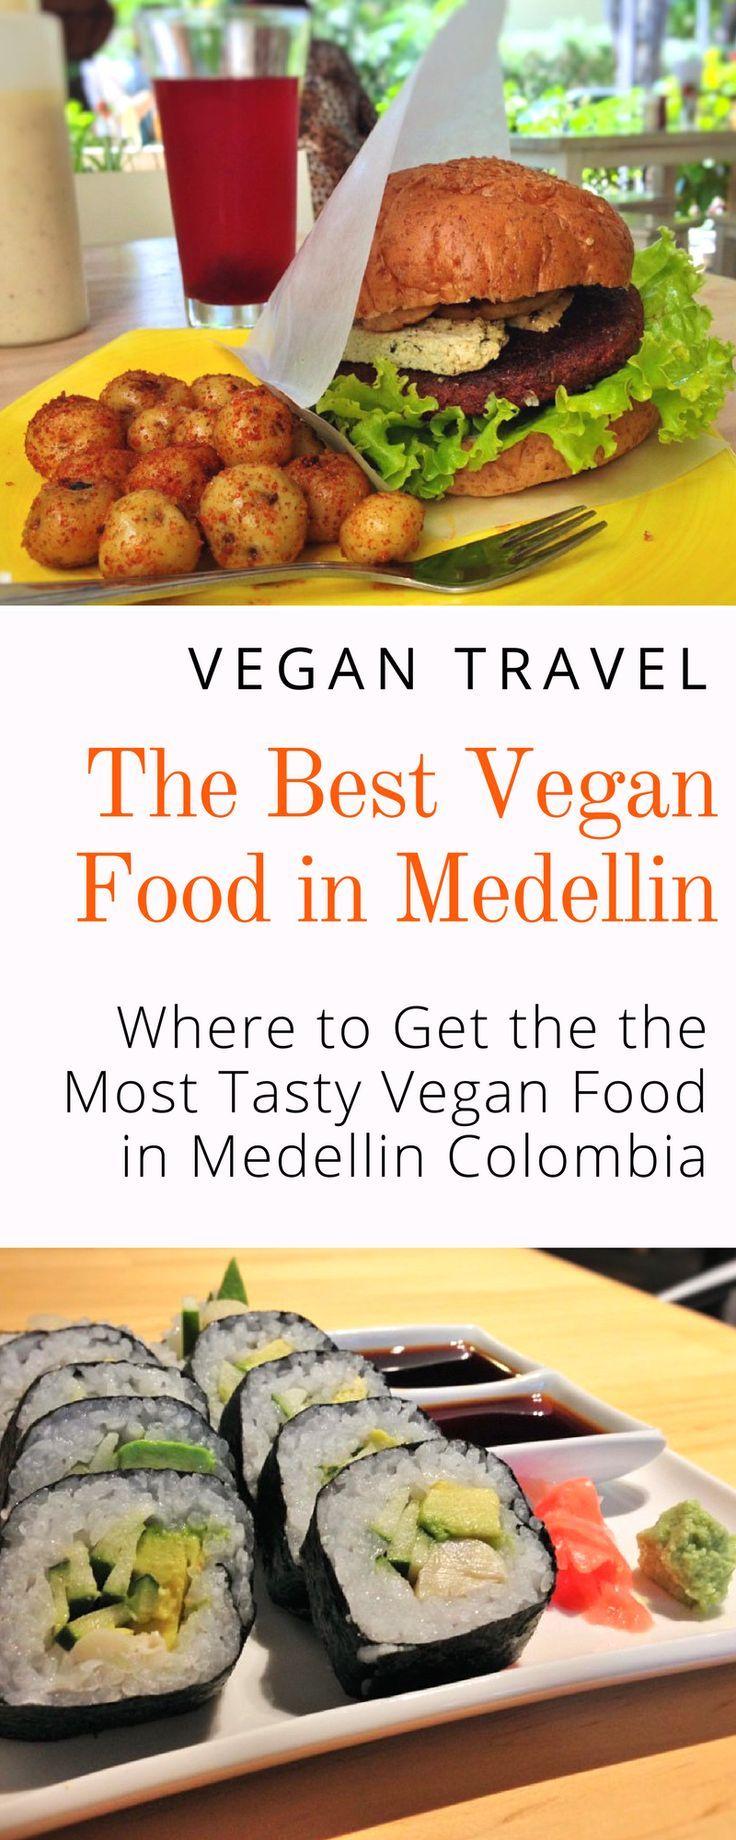 Vegan In Medellin Colombia Where To Eat Out Veggie Visa Best Vegan Restaurants Vegan Recipes Vegan Guide